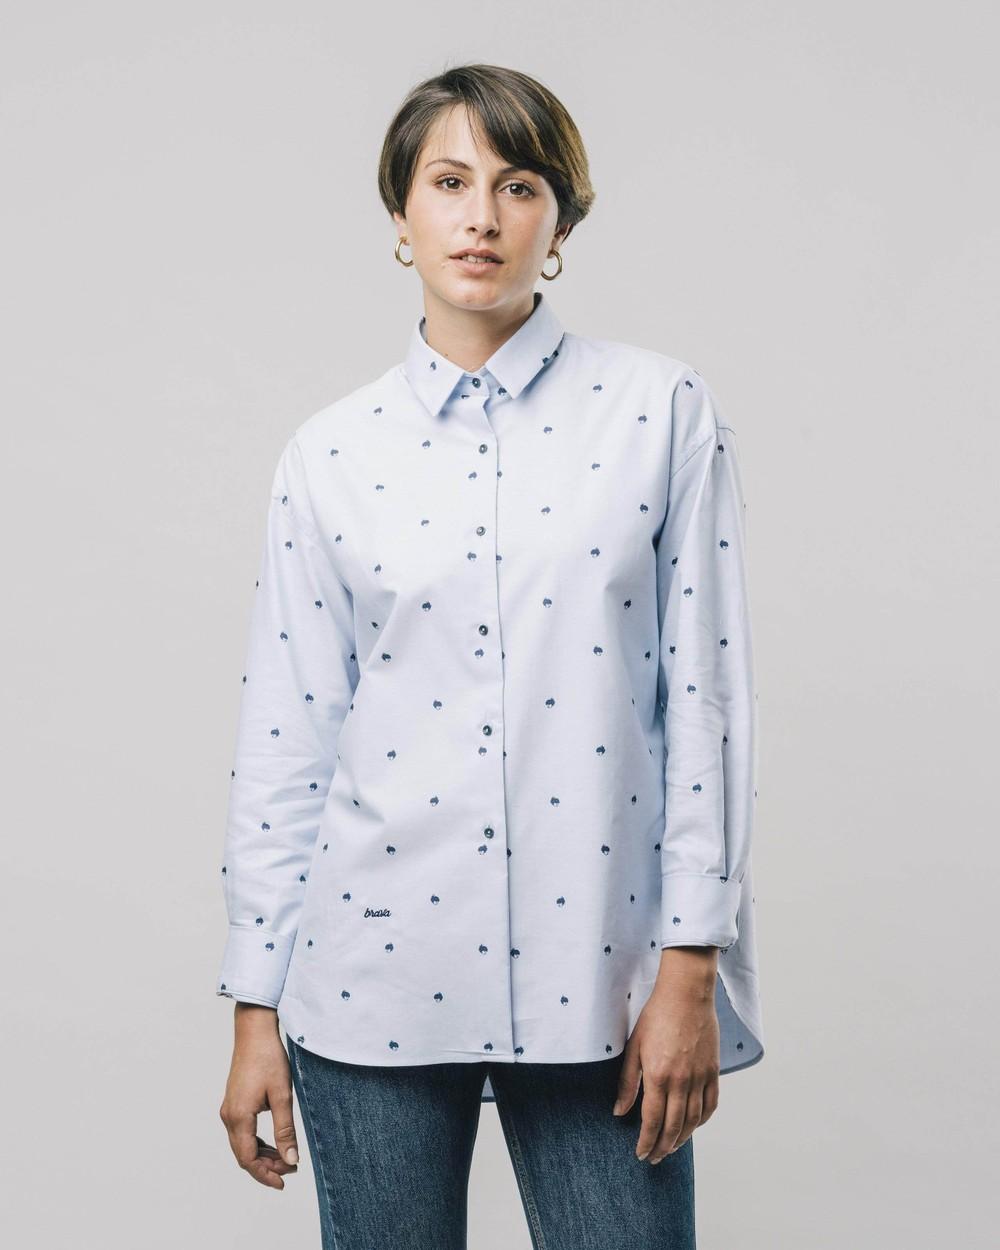 Yoko printed blouse - Brava Fabrics